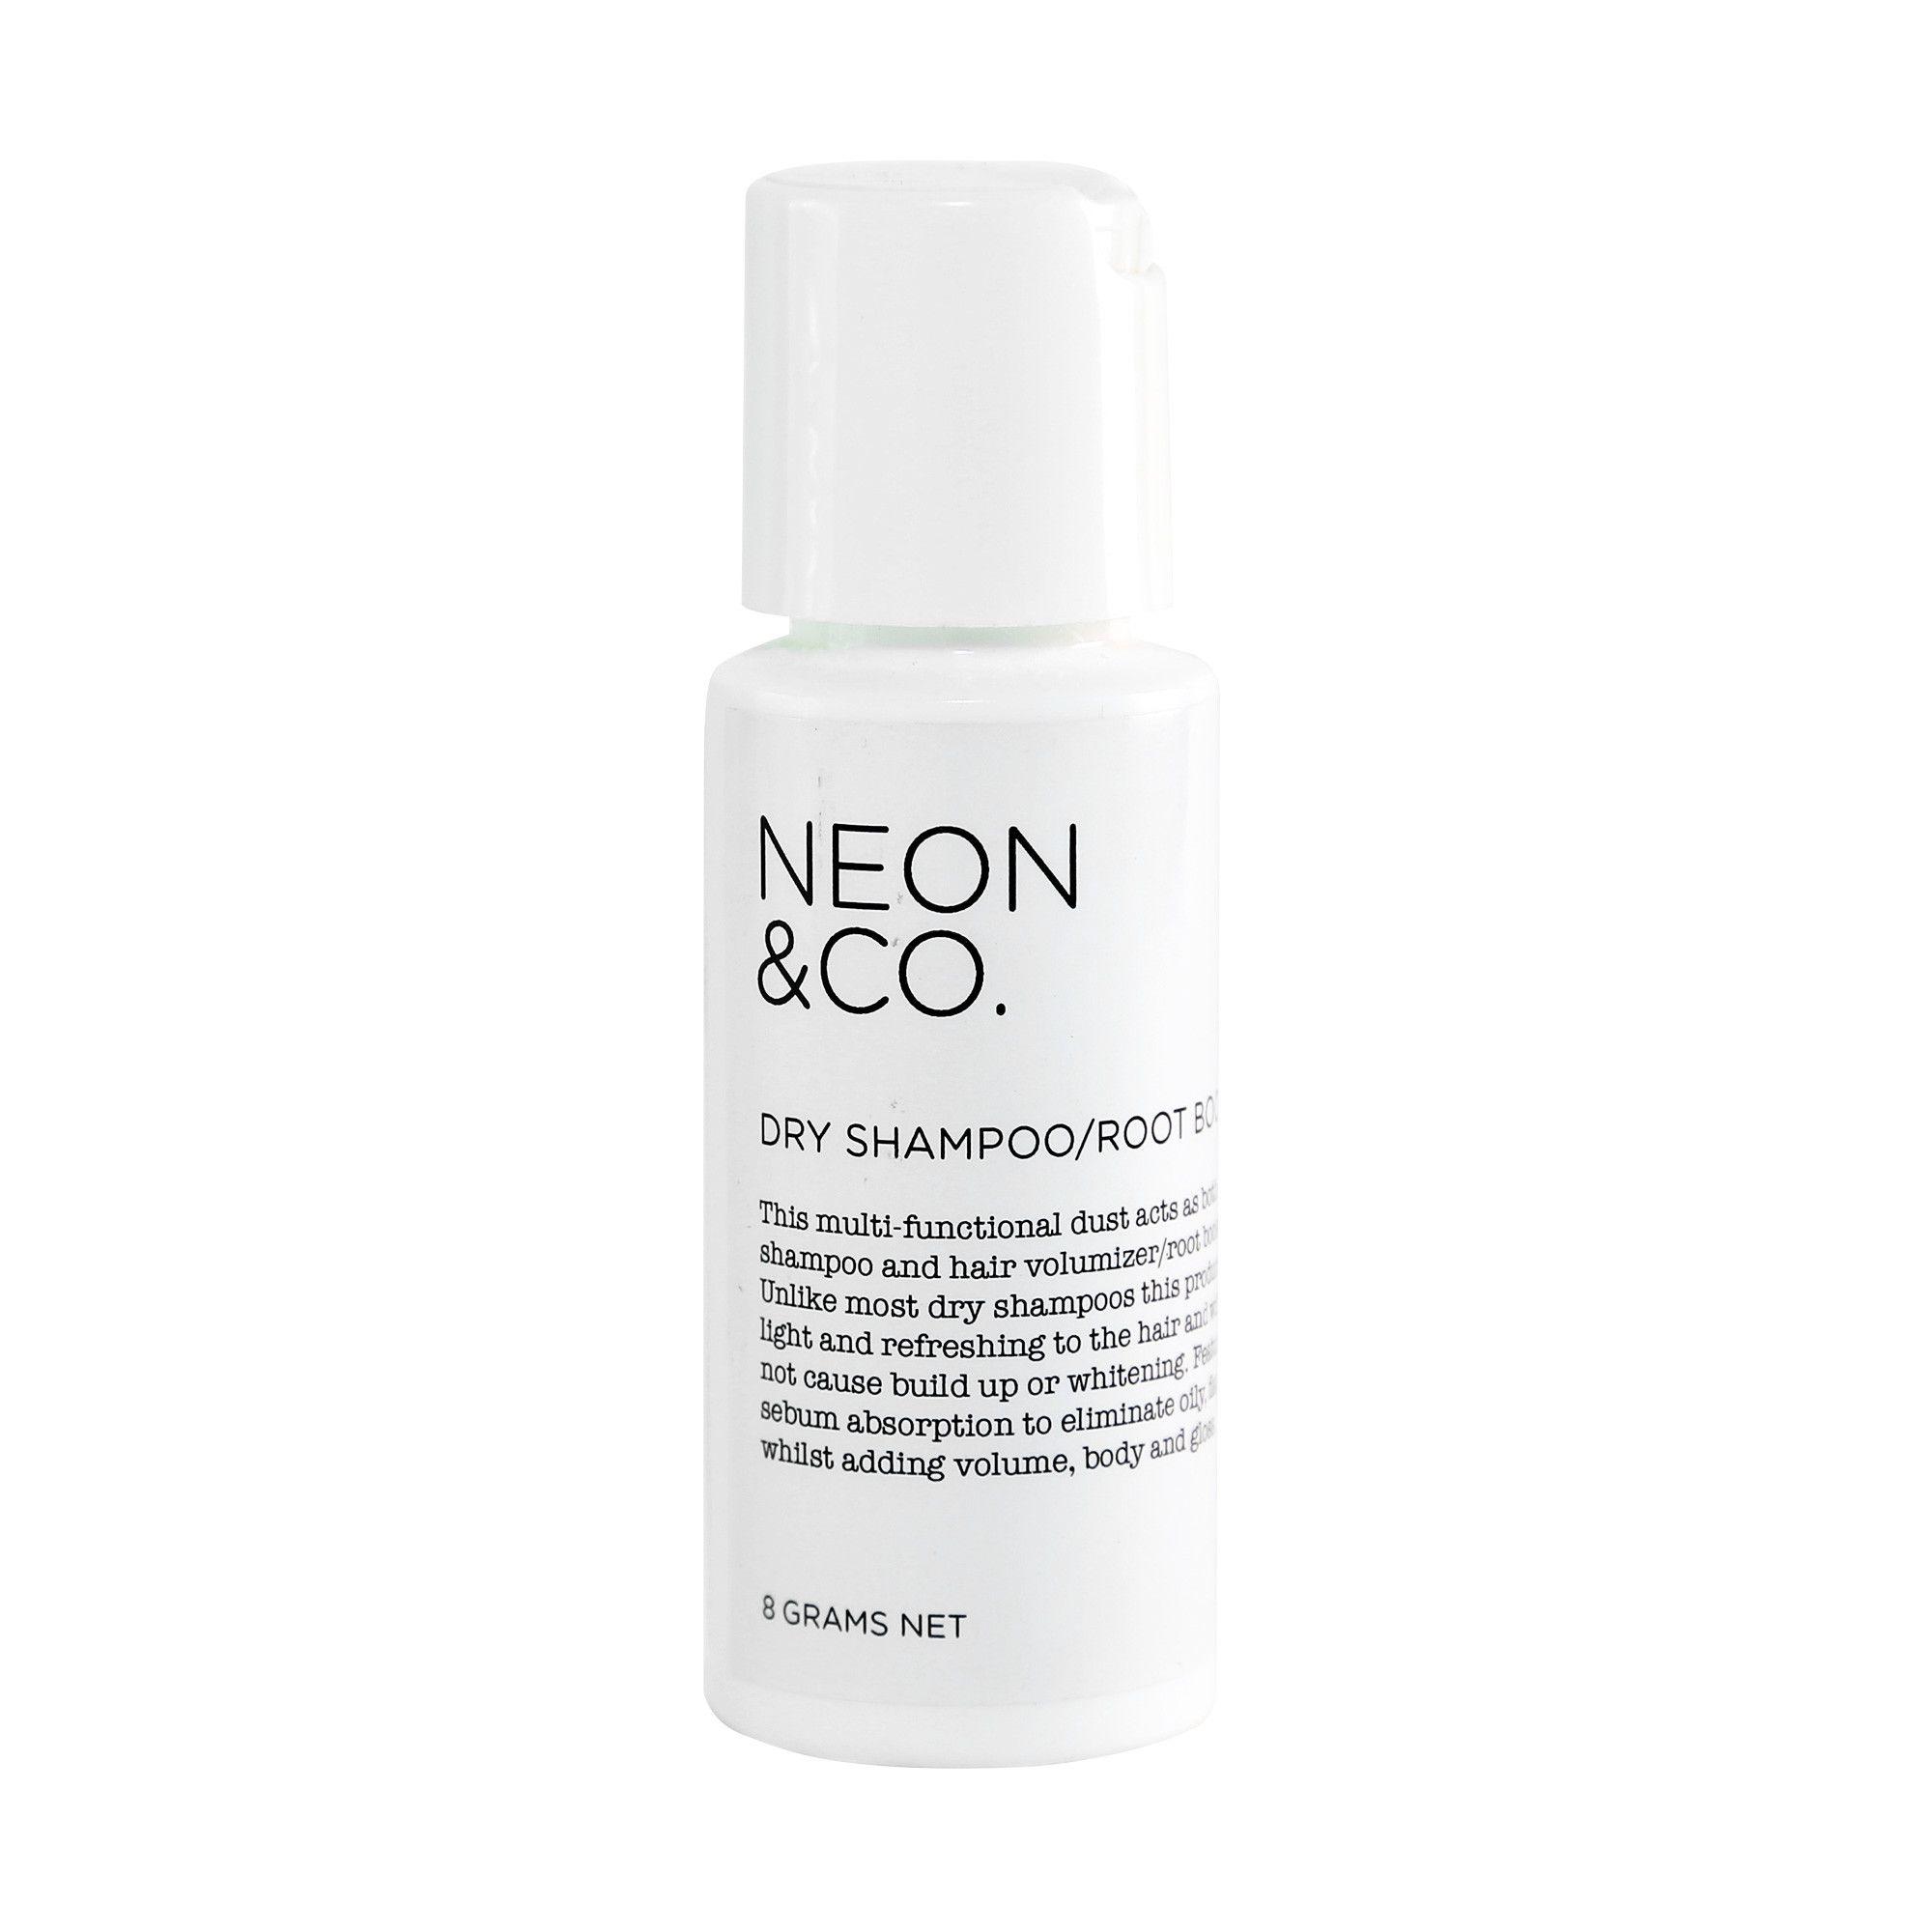 Neon & Co Dry Hair Shampoo oils hairwax hairandscalp